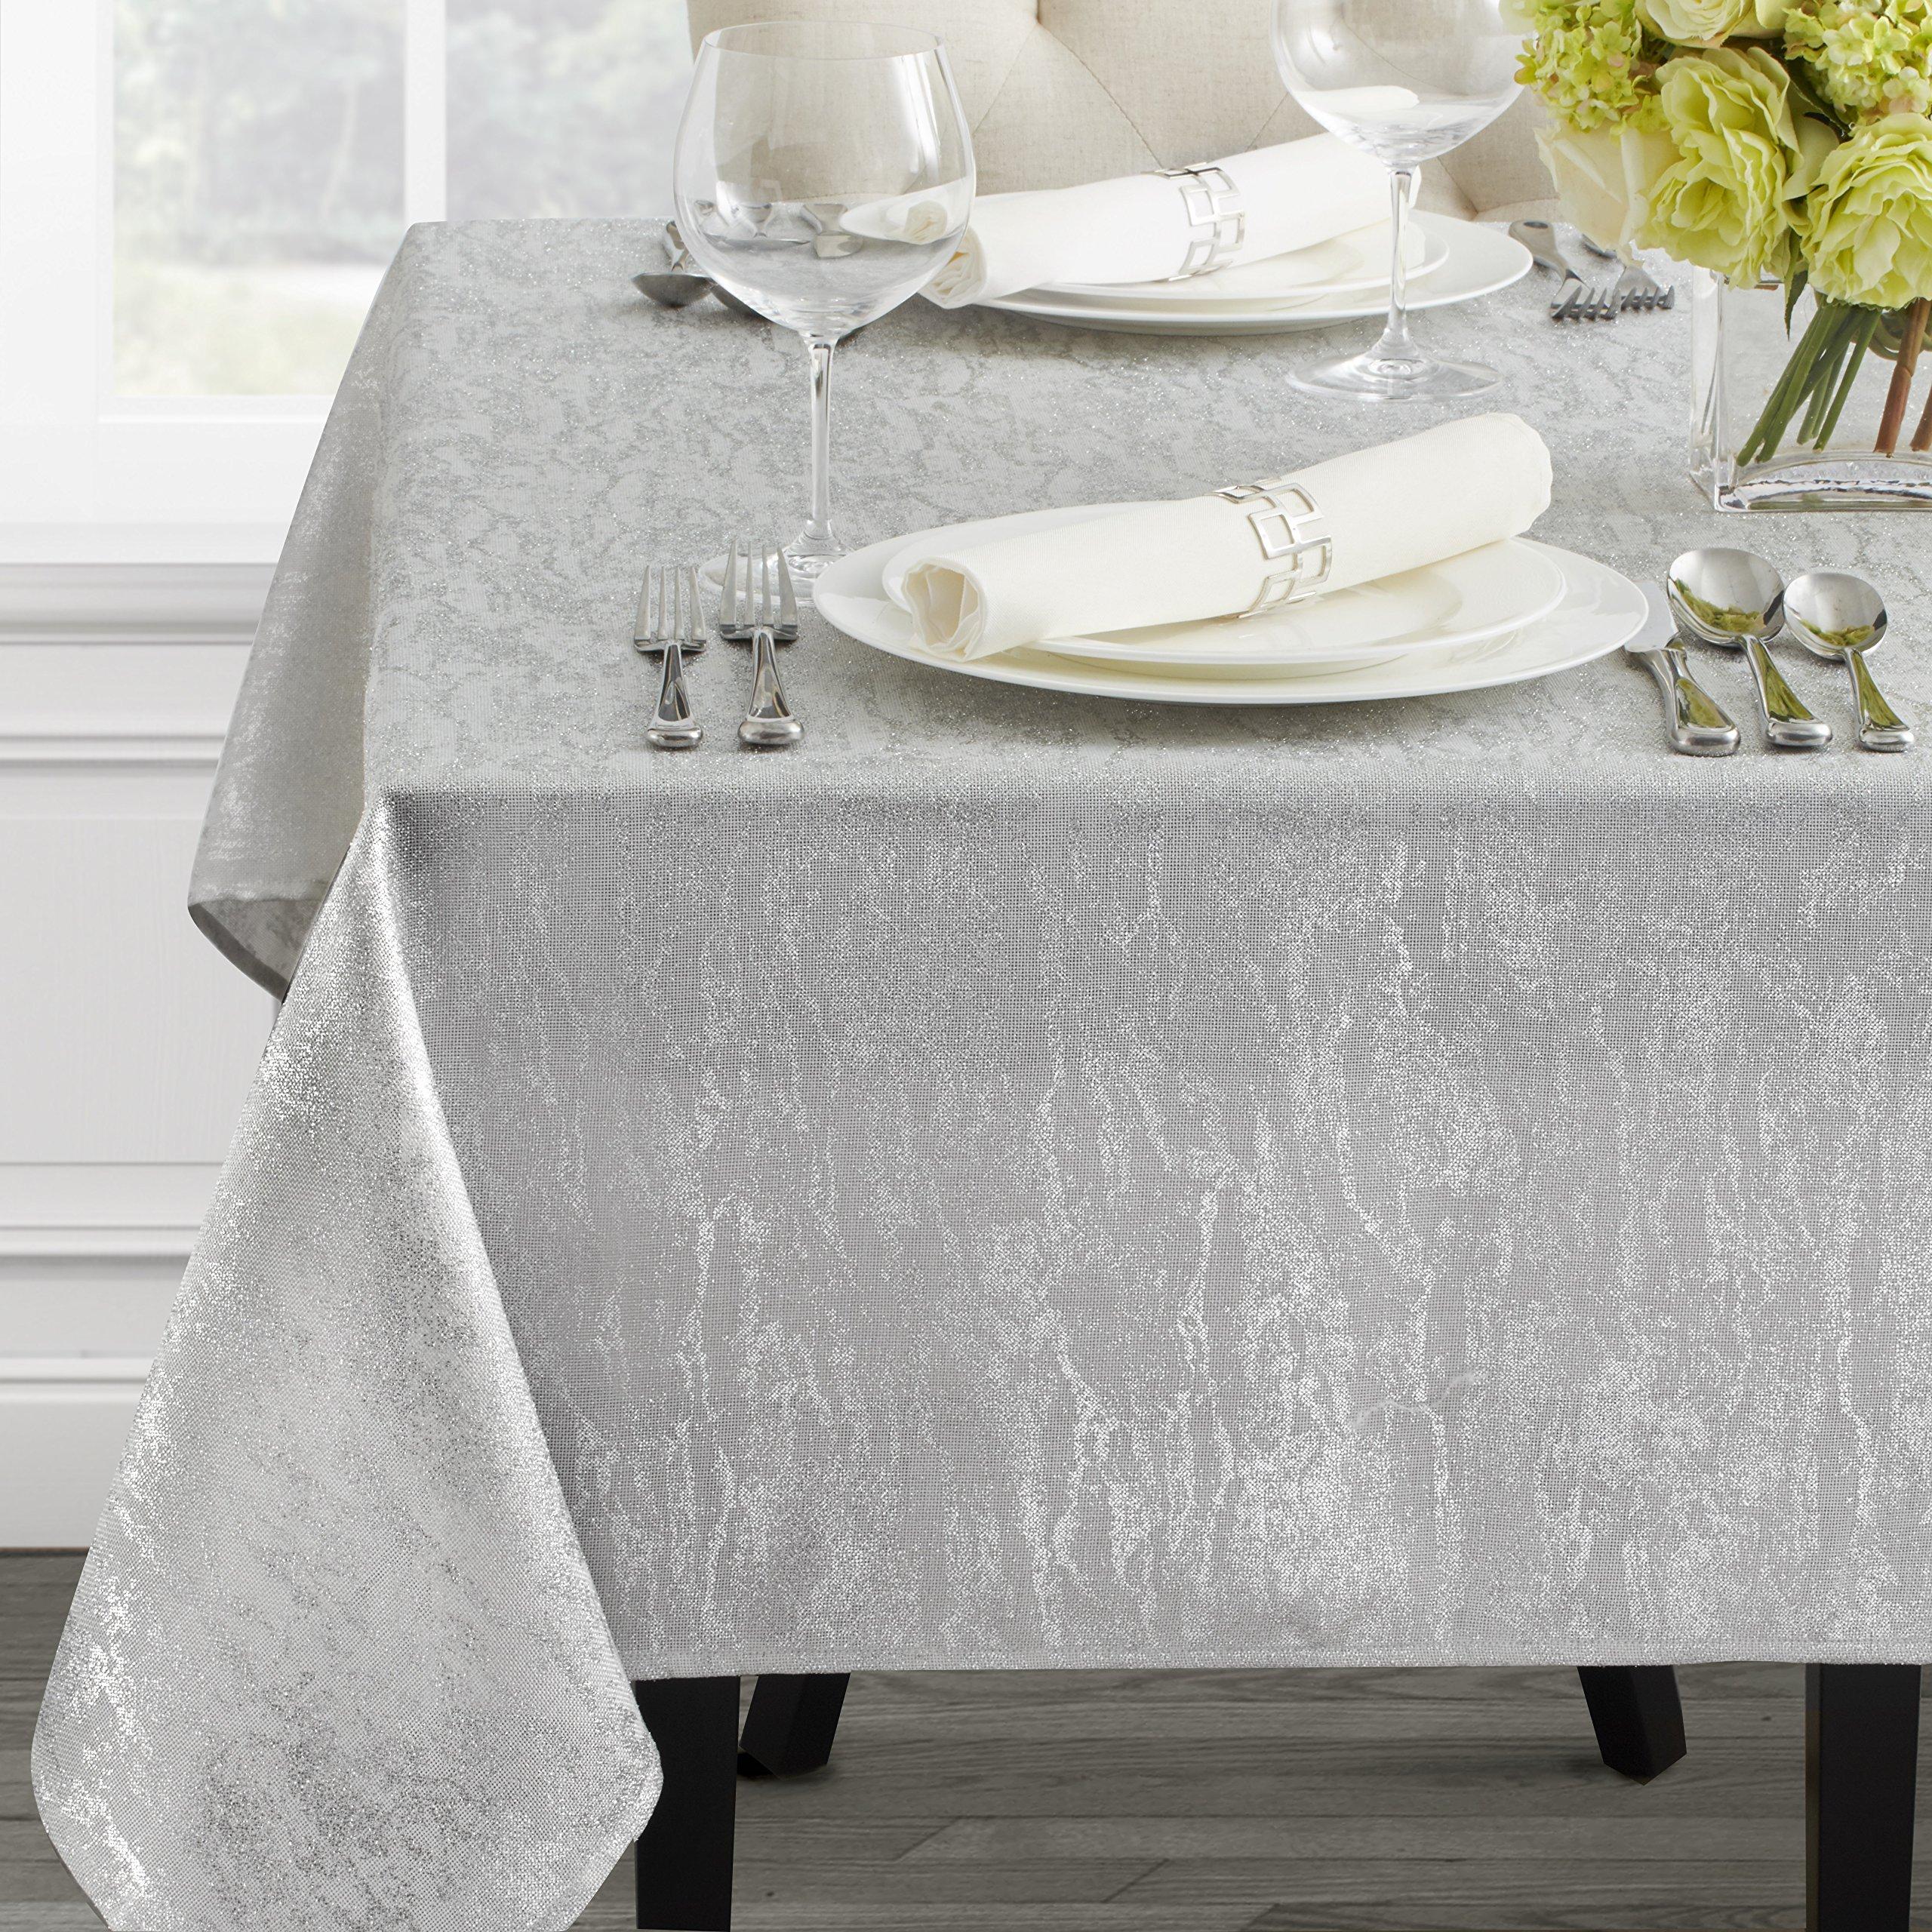 Benson Mills Metals Metallic Tablecloth (60'' x 144'' Rectangular, Ivory-Silver)